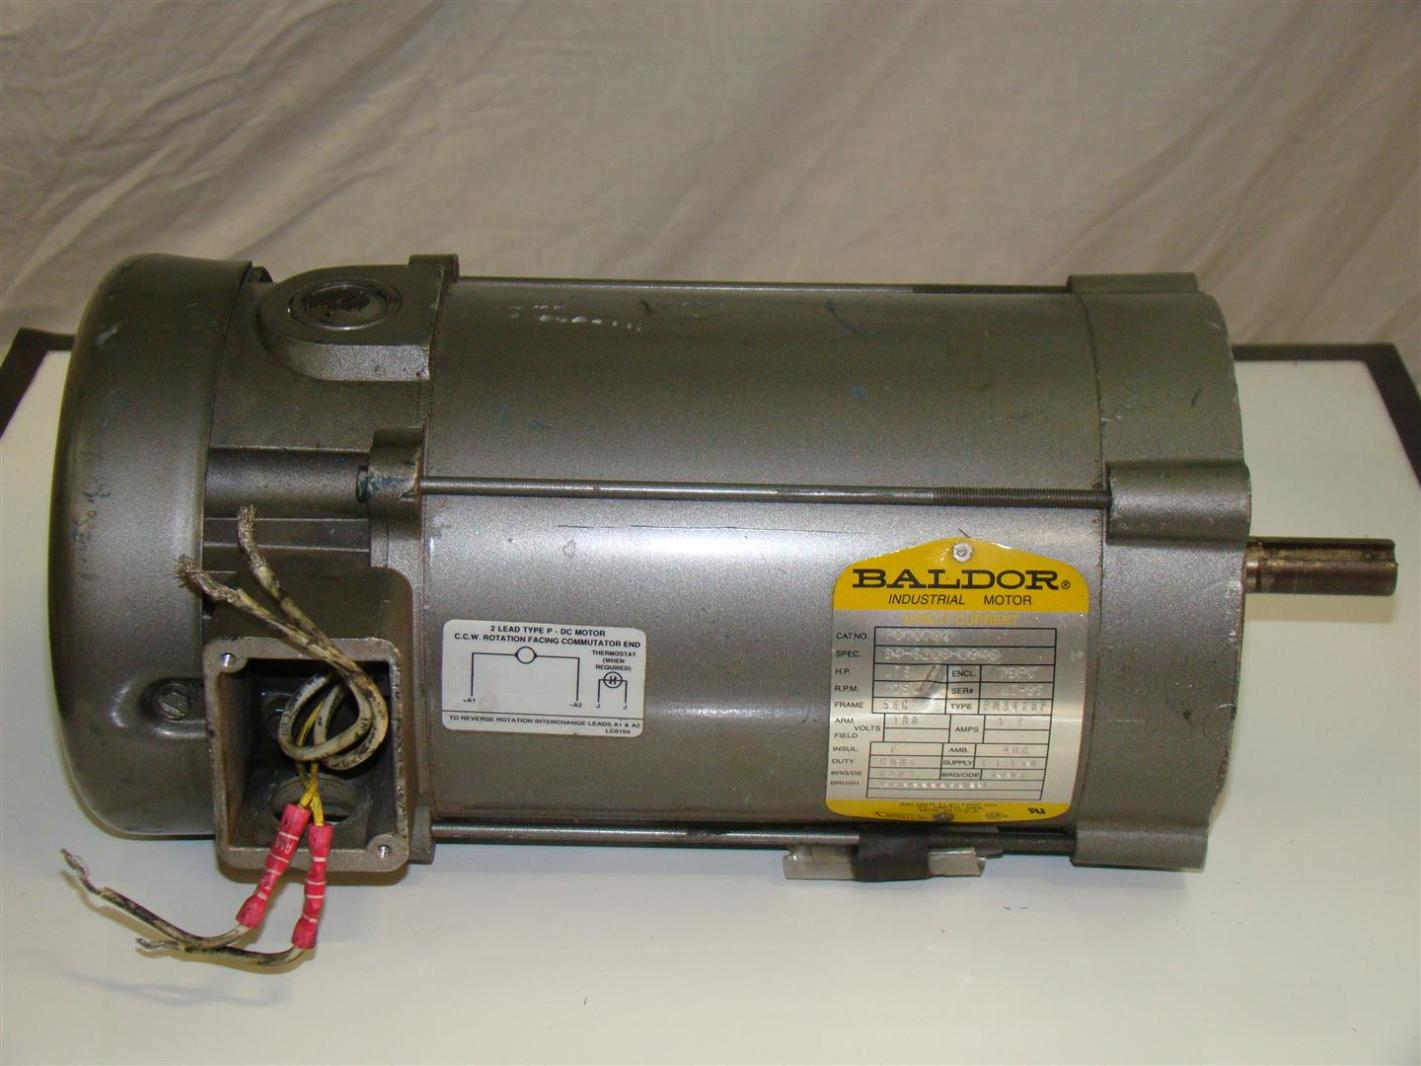 Baldor Dc Motor 75hp 1750rpm 180v 34 6208 3946 P010788